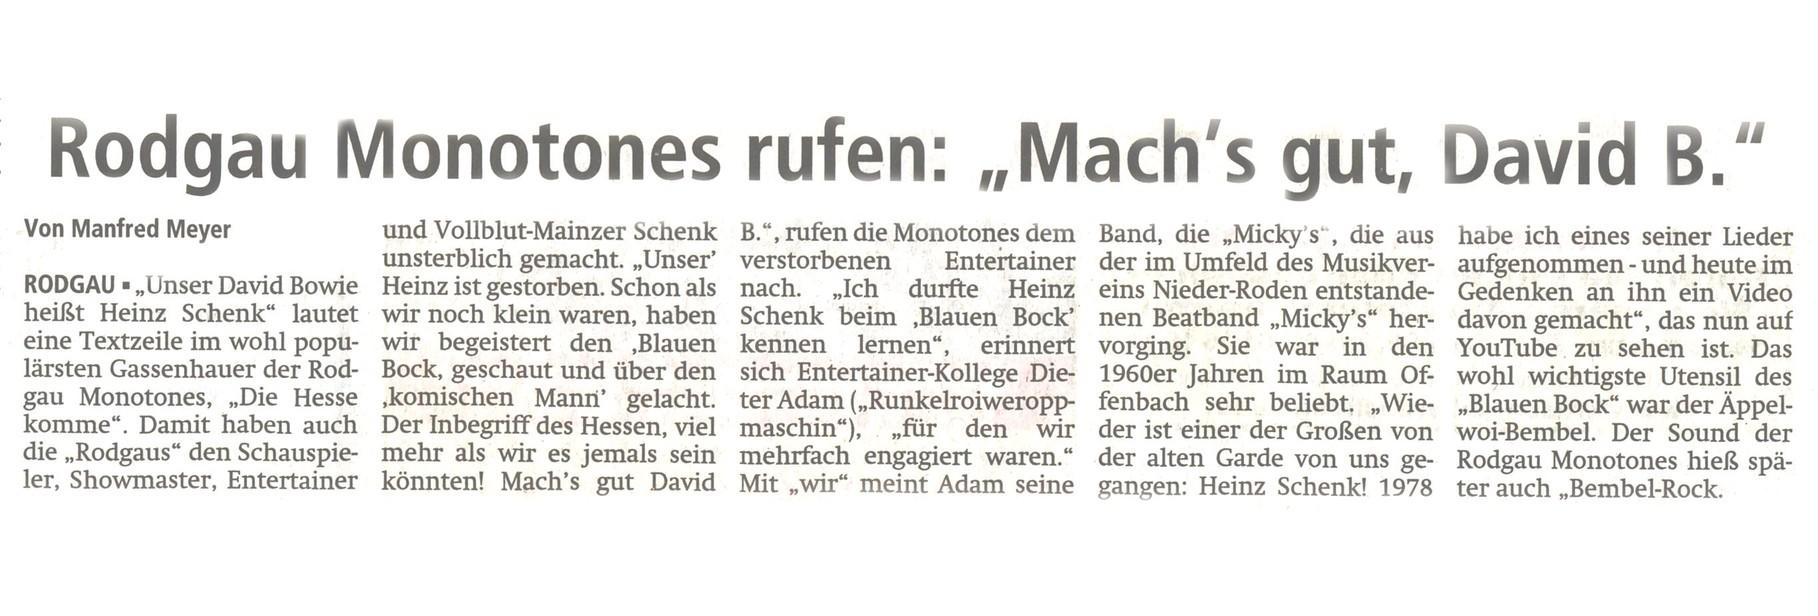 Offenbach Post, 3. Mai 2014